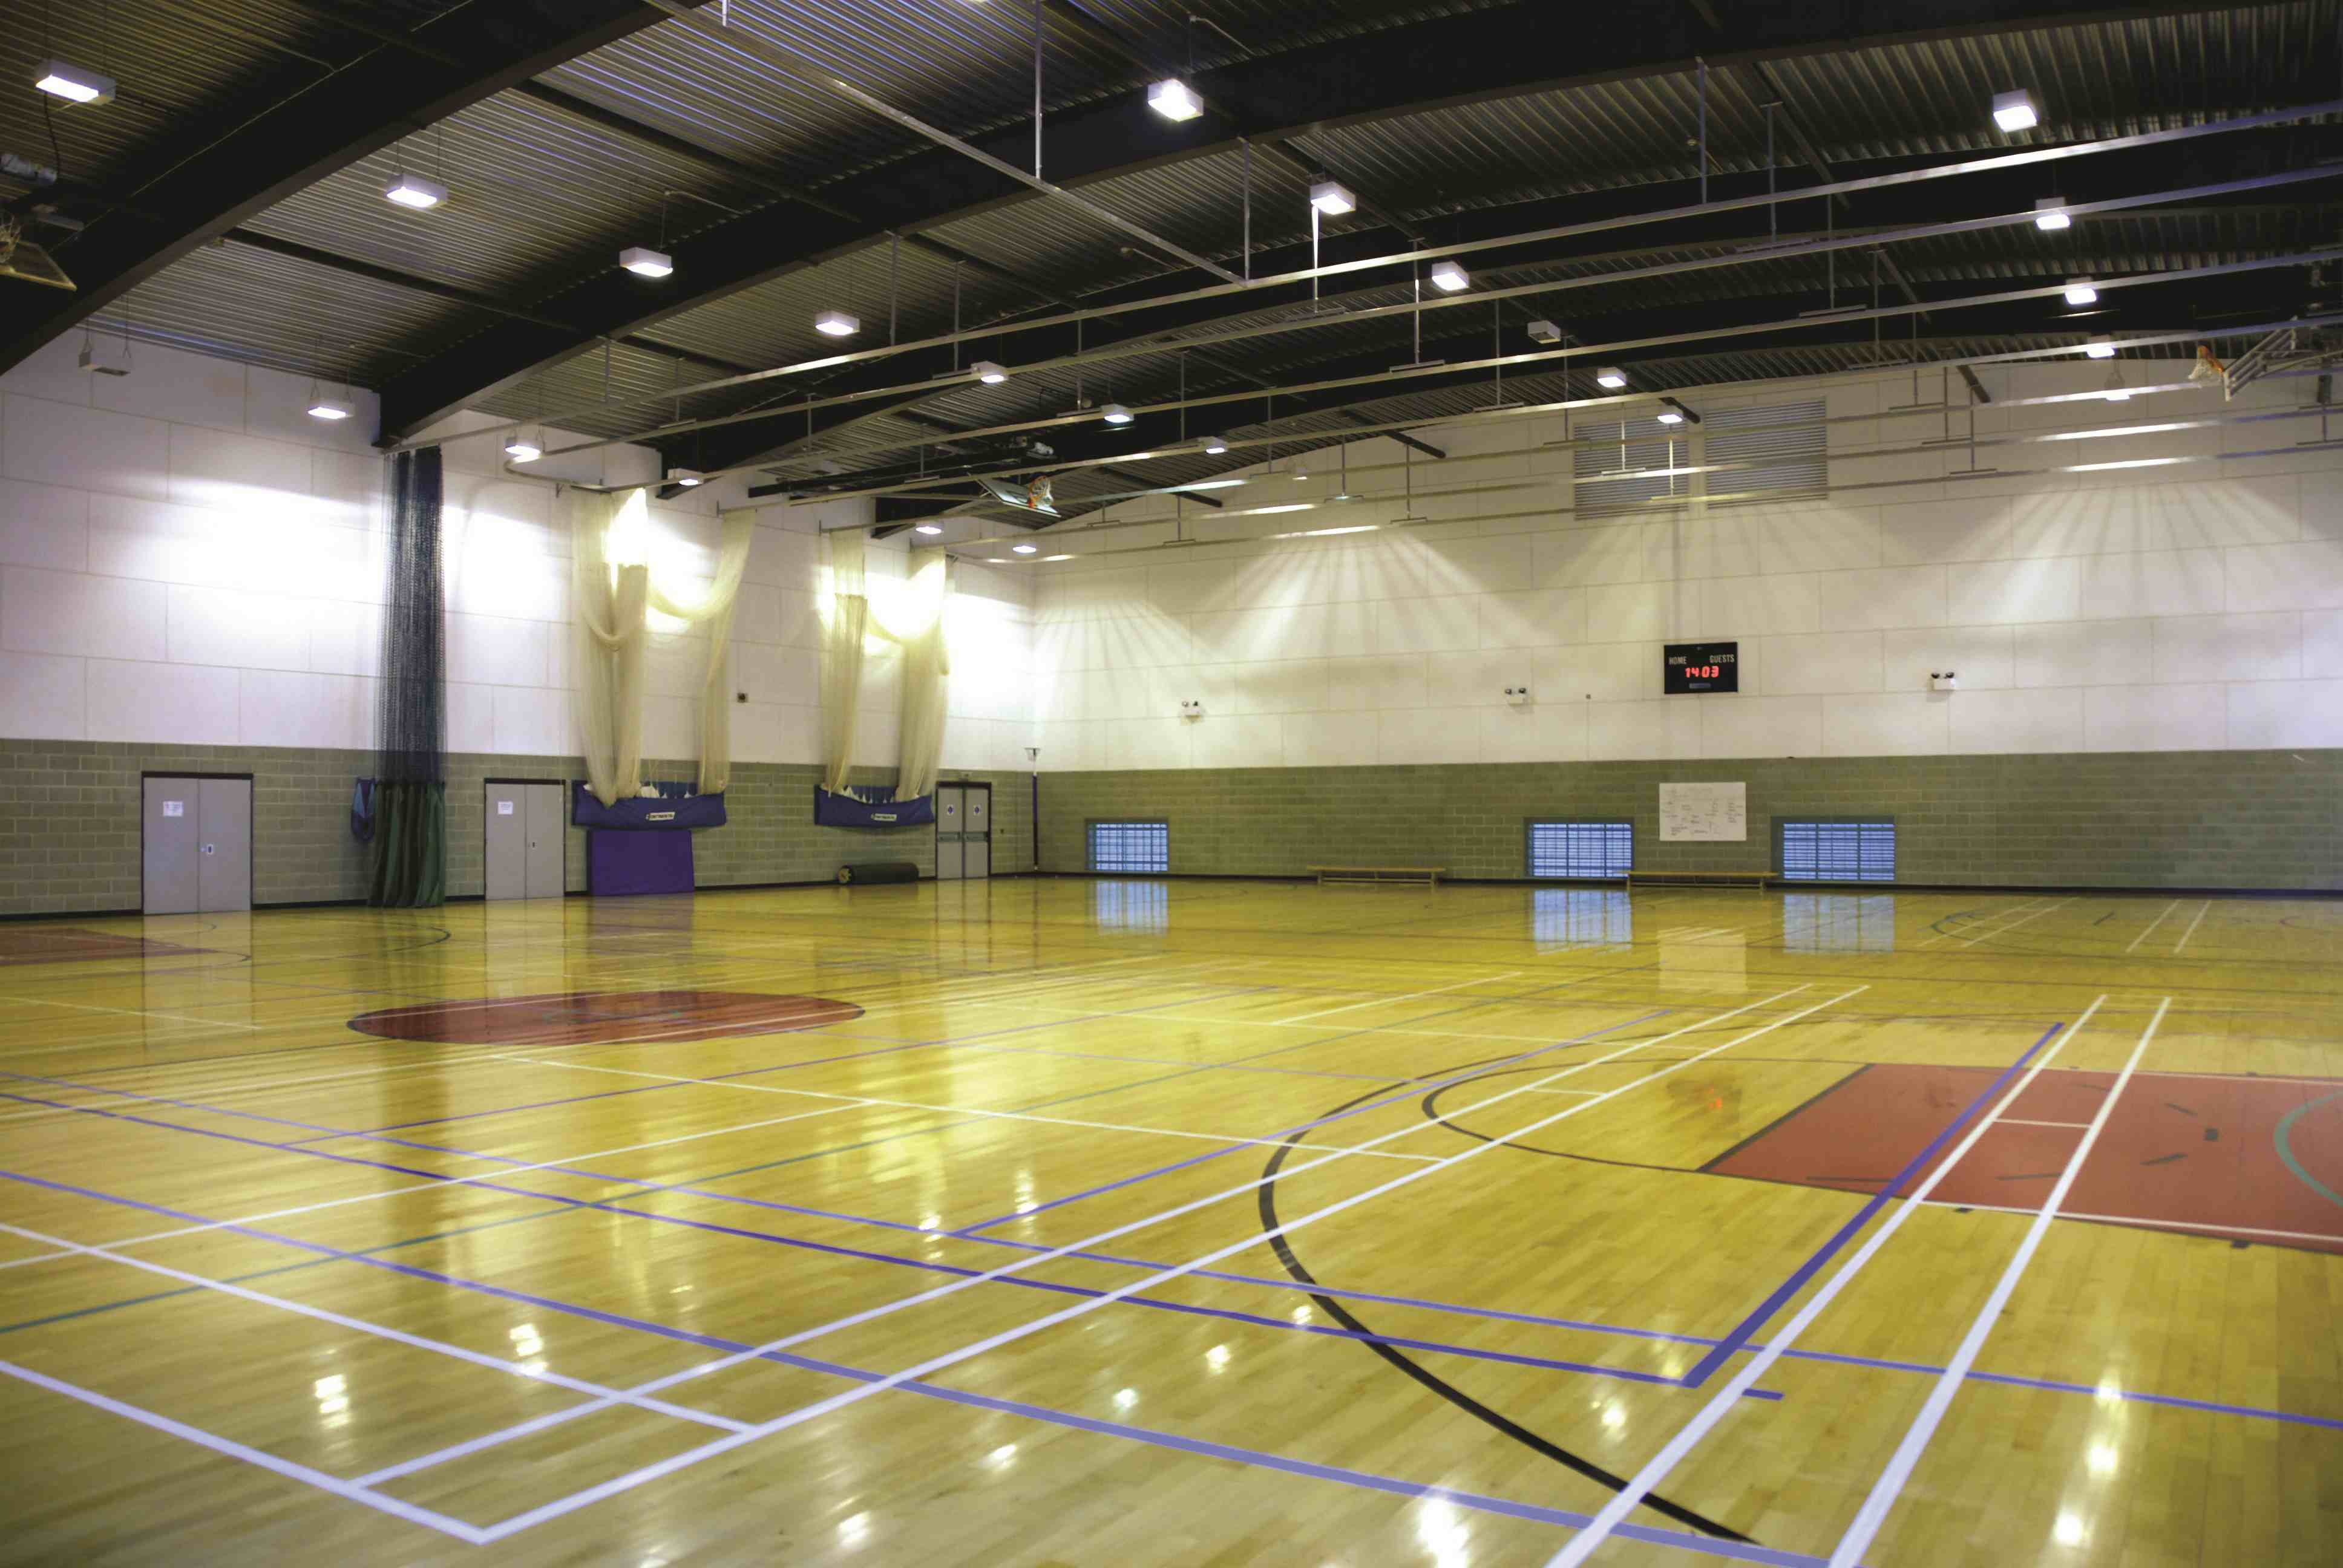 017. Sports Hall